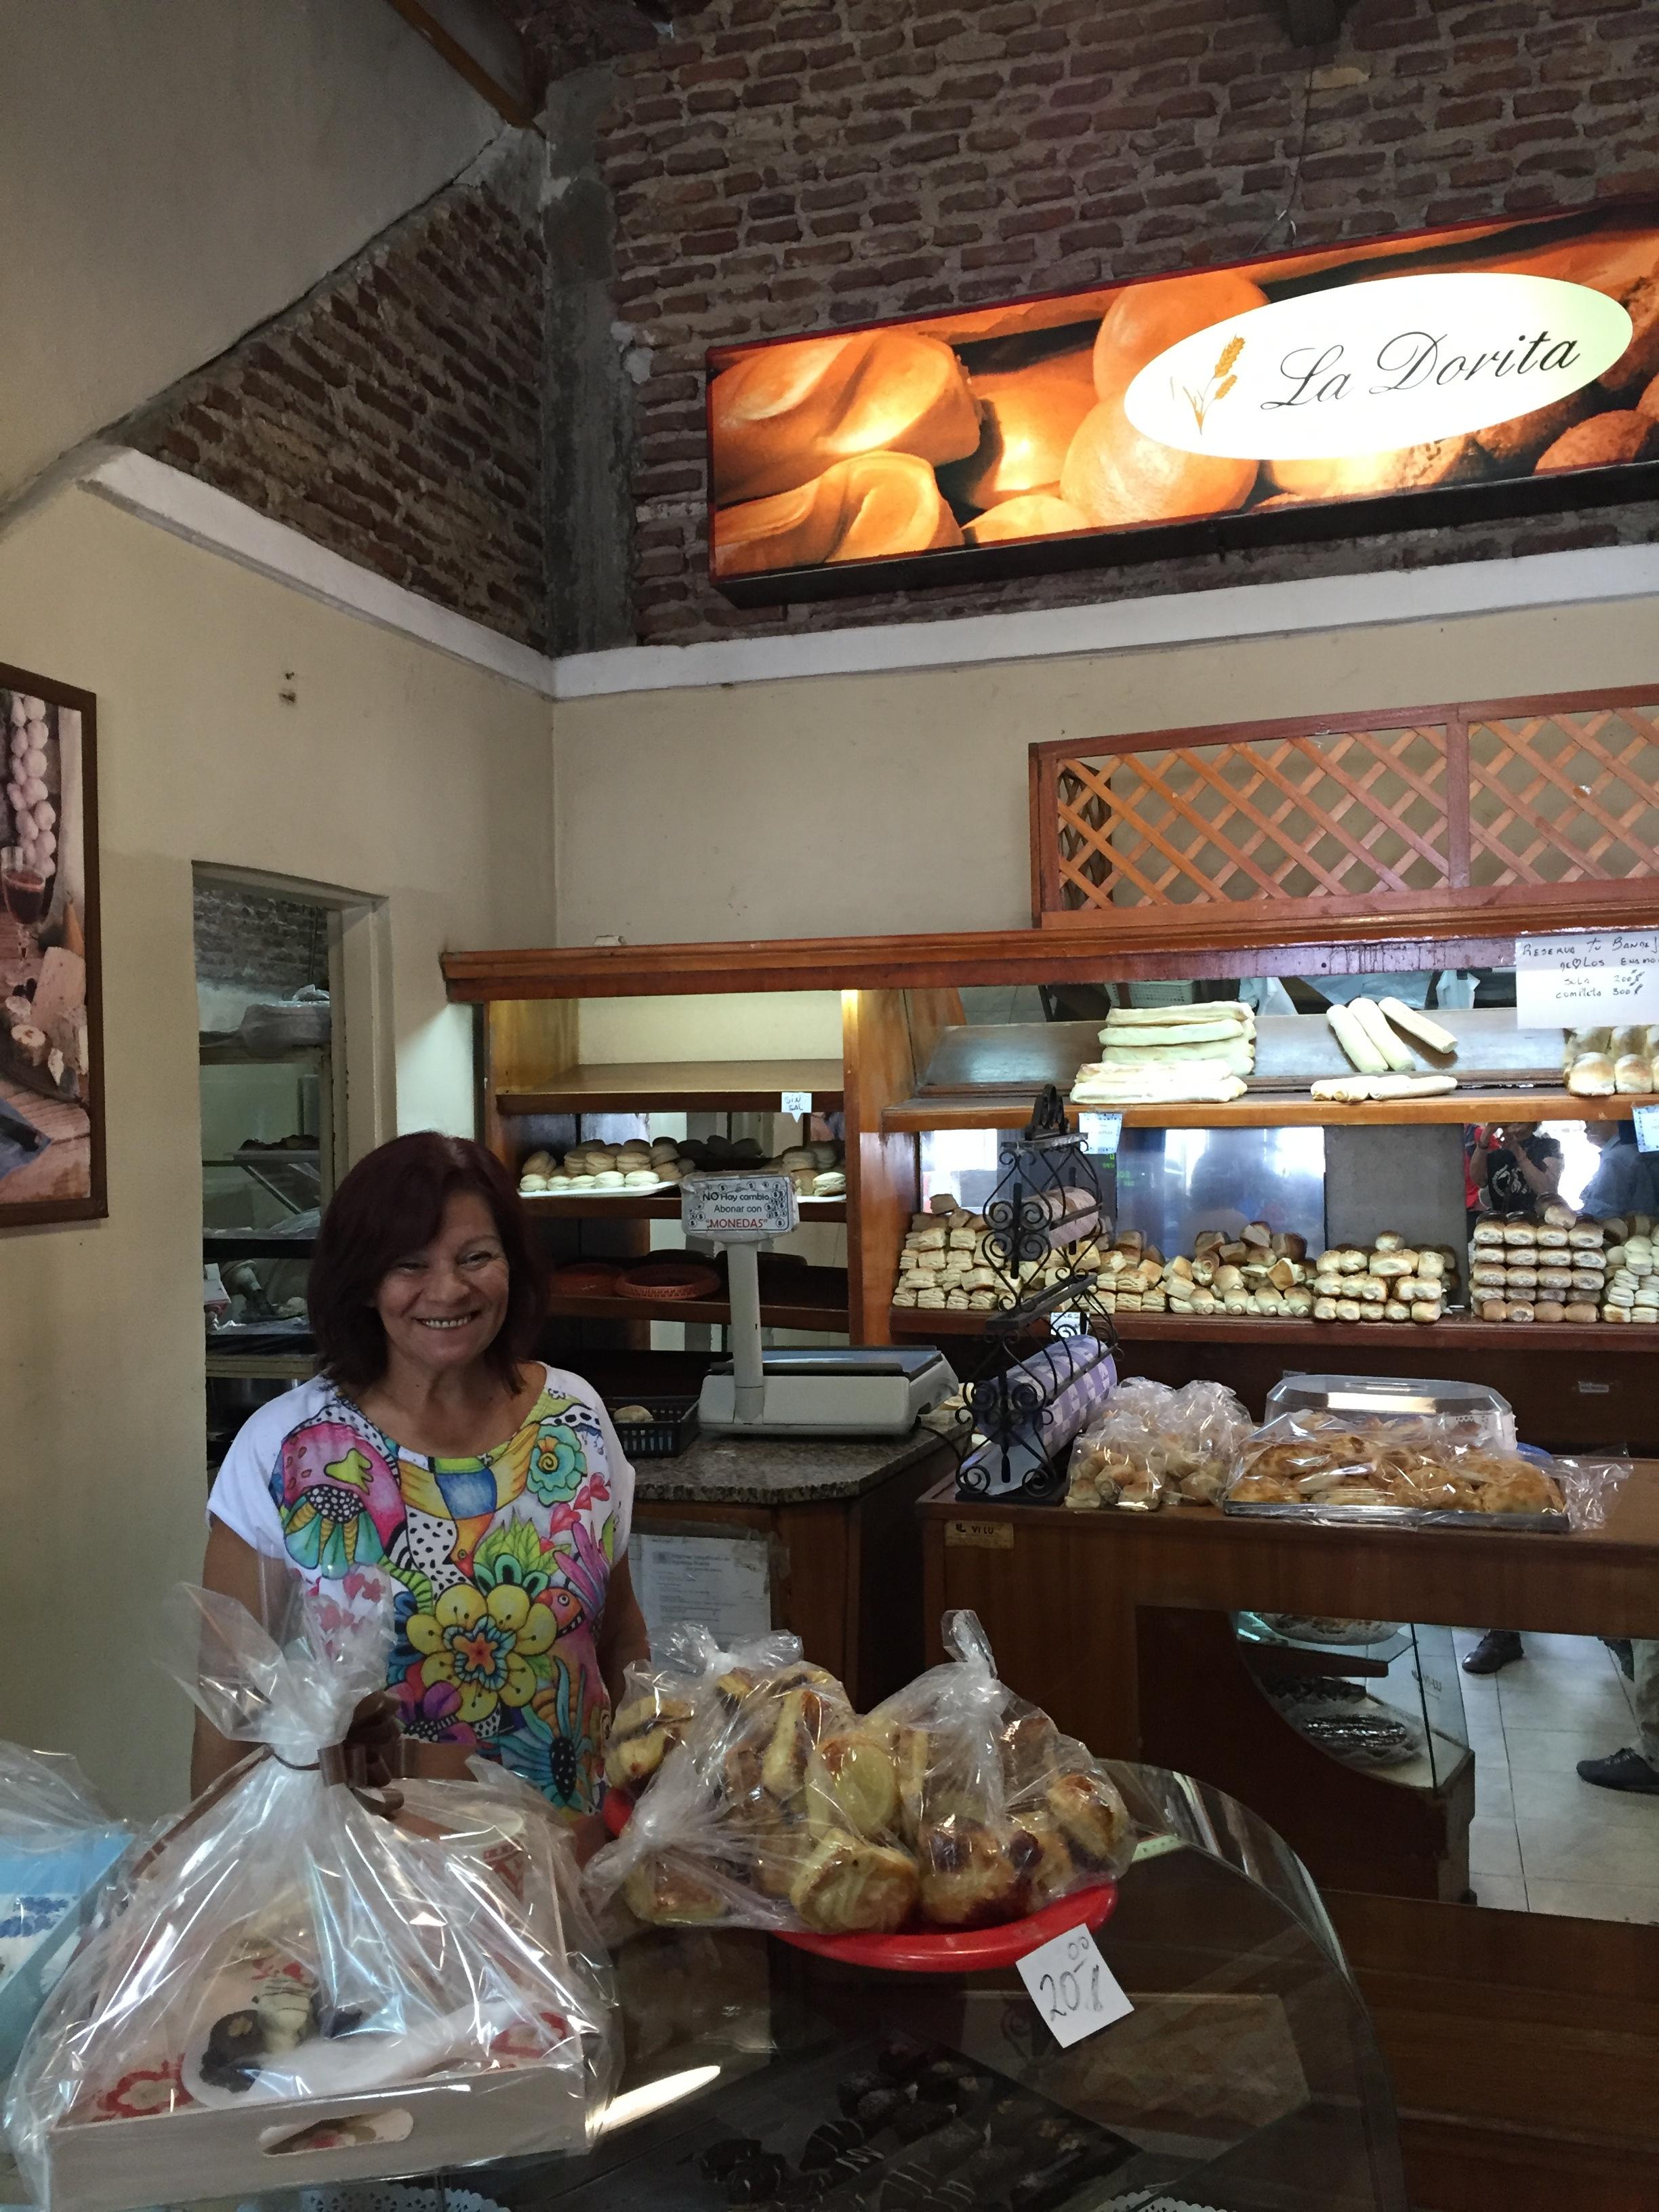 La Dorita Cafe in the La Boca district where this charming proprietor served wonderful pastries and coffee.